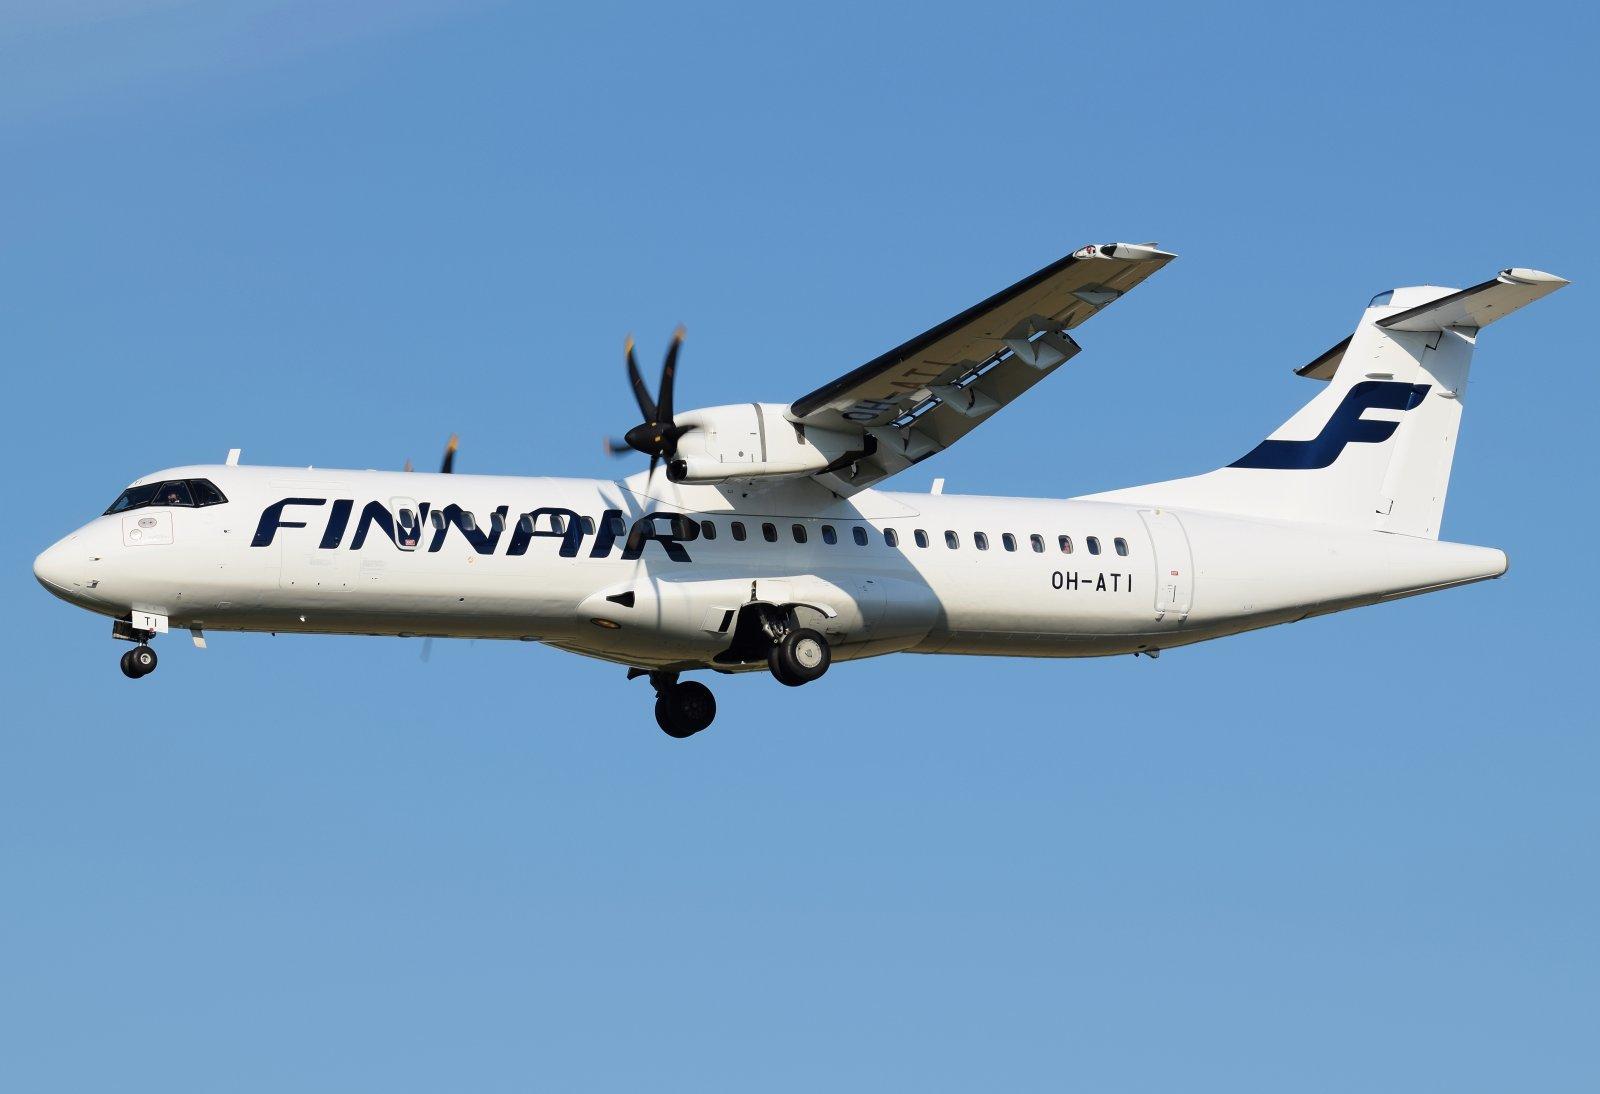 OH-ATI - ATR 72-500 - Finnair - 21.5.2019